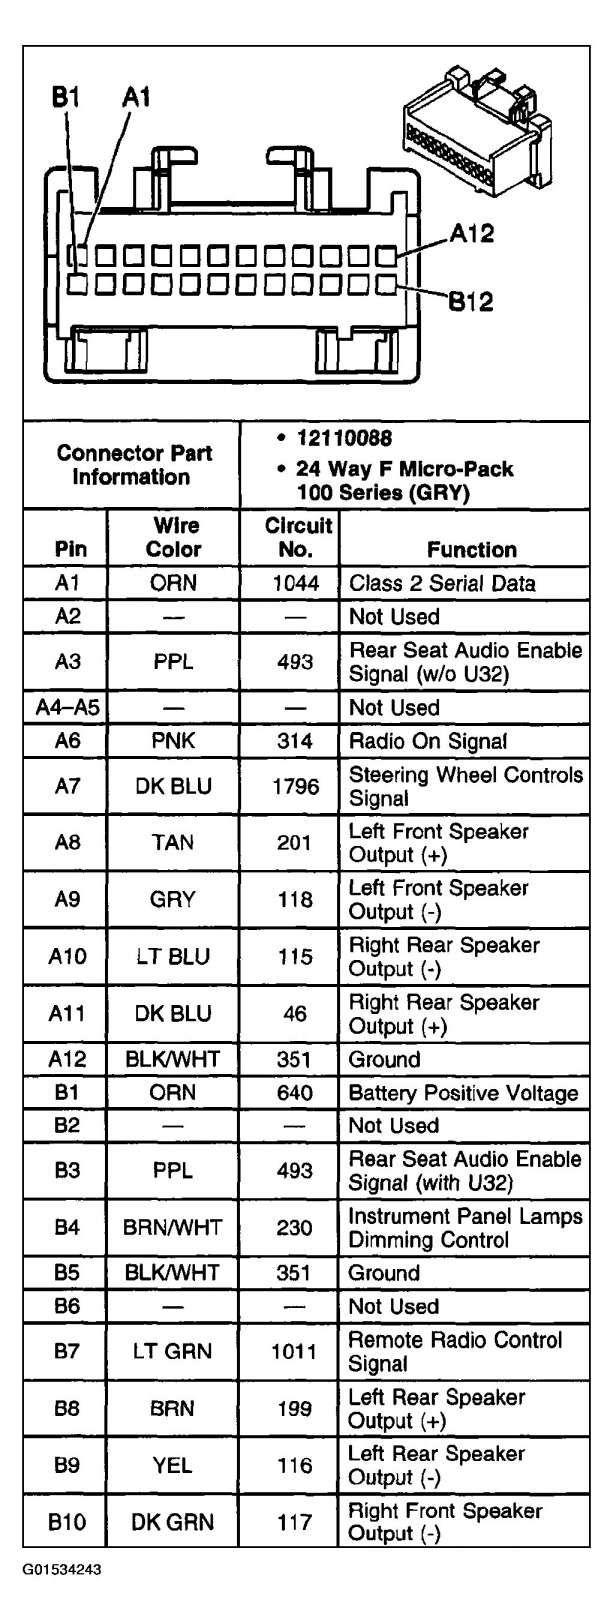 18 2003 Chevy Truck Radio Wiring Diagram Truck Diagram Wiringg Net Chevy Trailblazer Radio Chevy Malibu